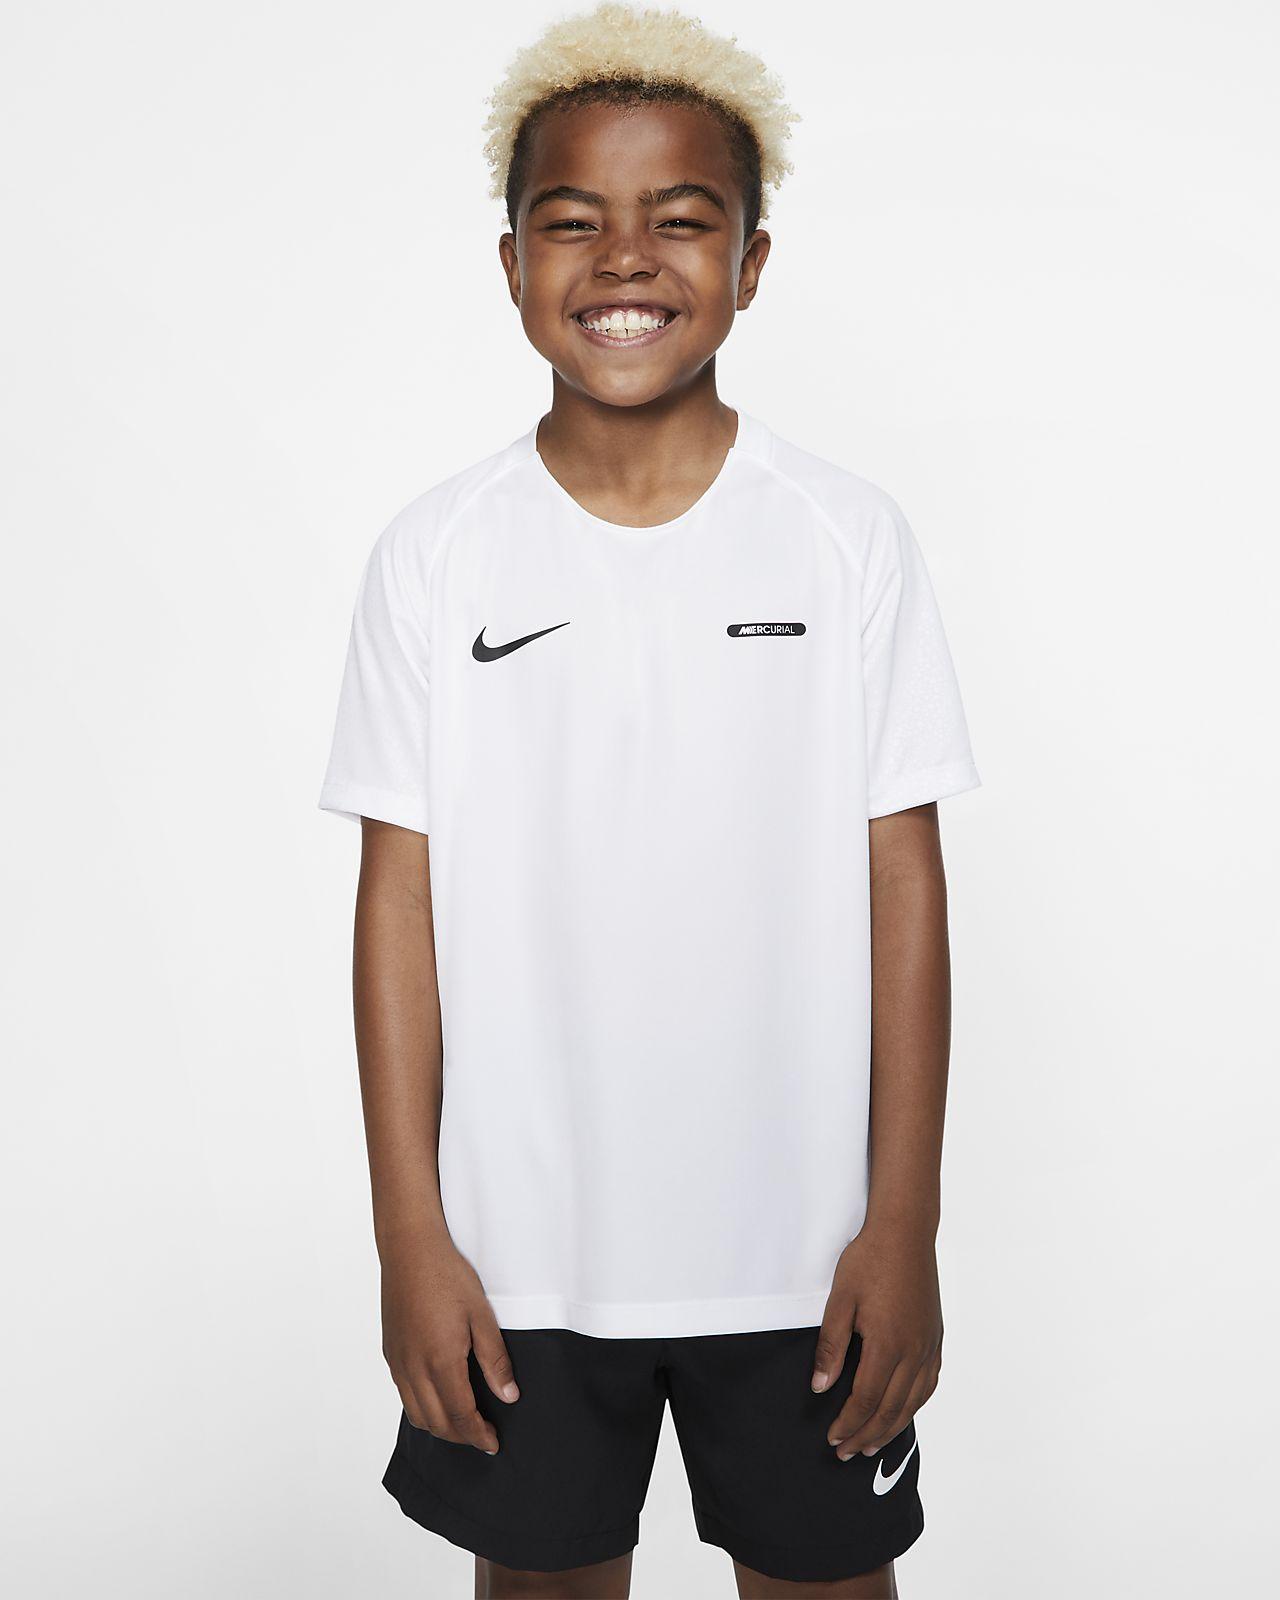 e40271c95 Nike Dri-FIT Mercurial Older Kids' Short-Sleeve Football Top. Nike ...